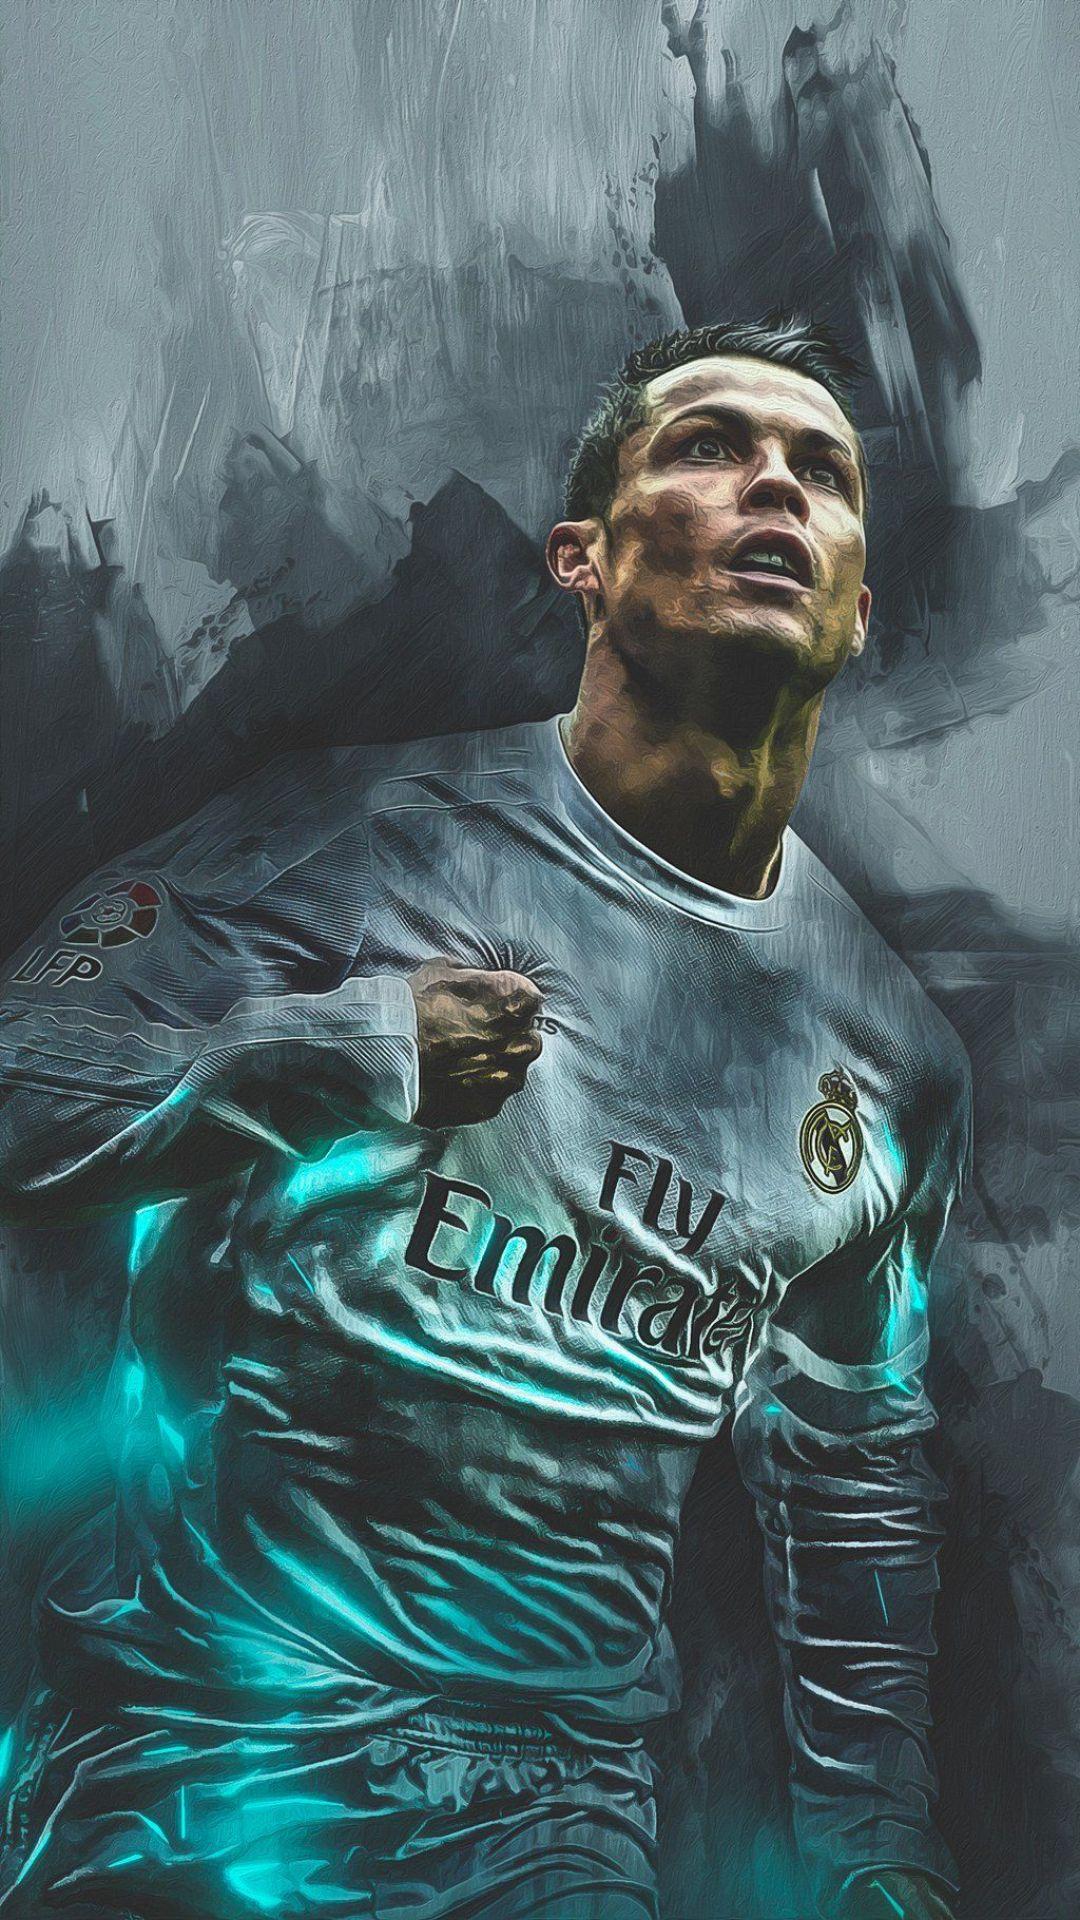 [40] Cristiano Ronaldo Cool   Android iPhone Desktop HD 1080x1920